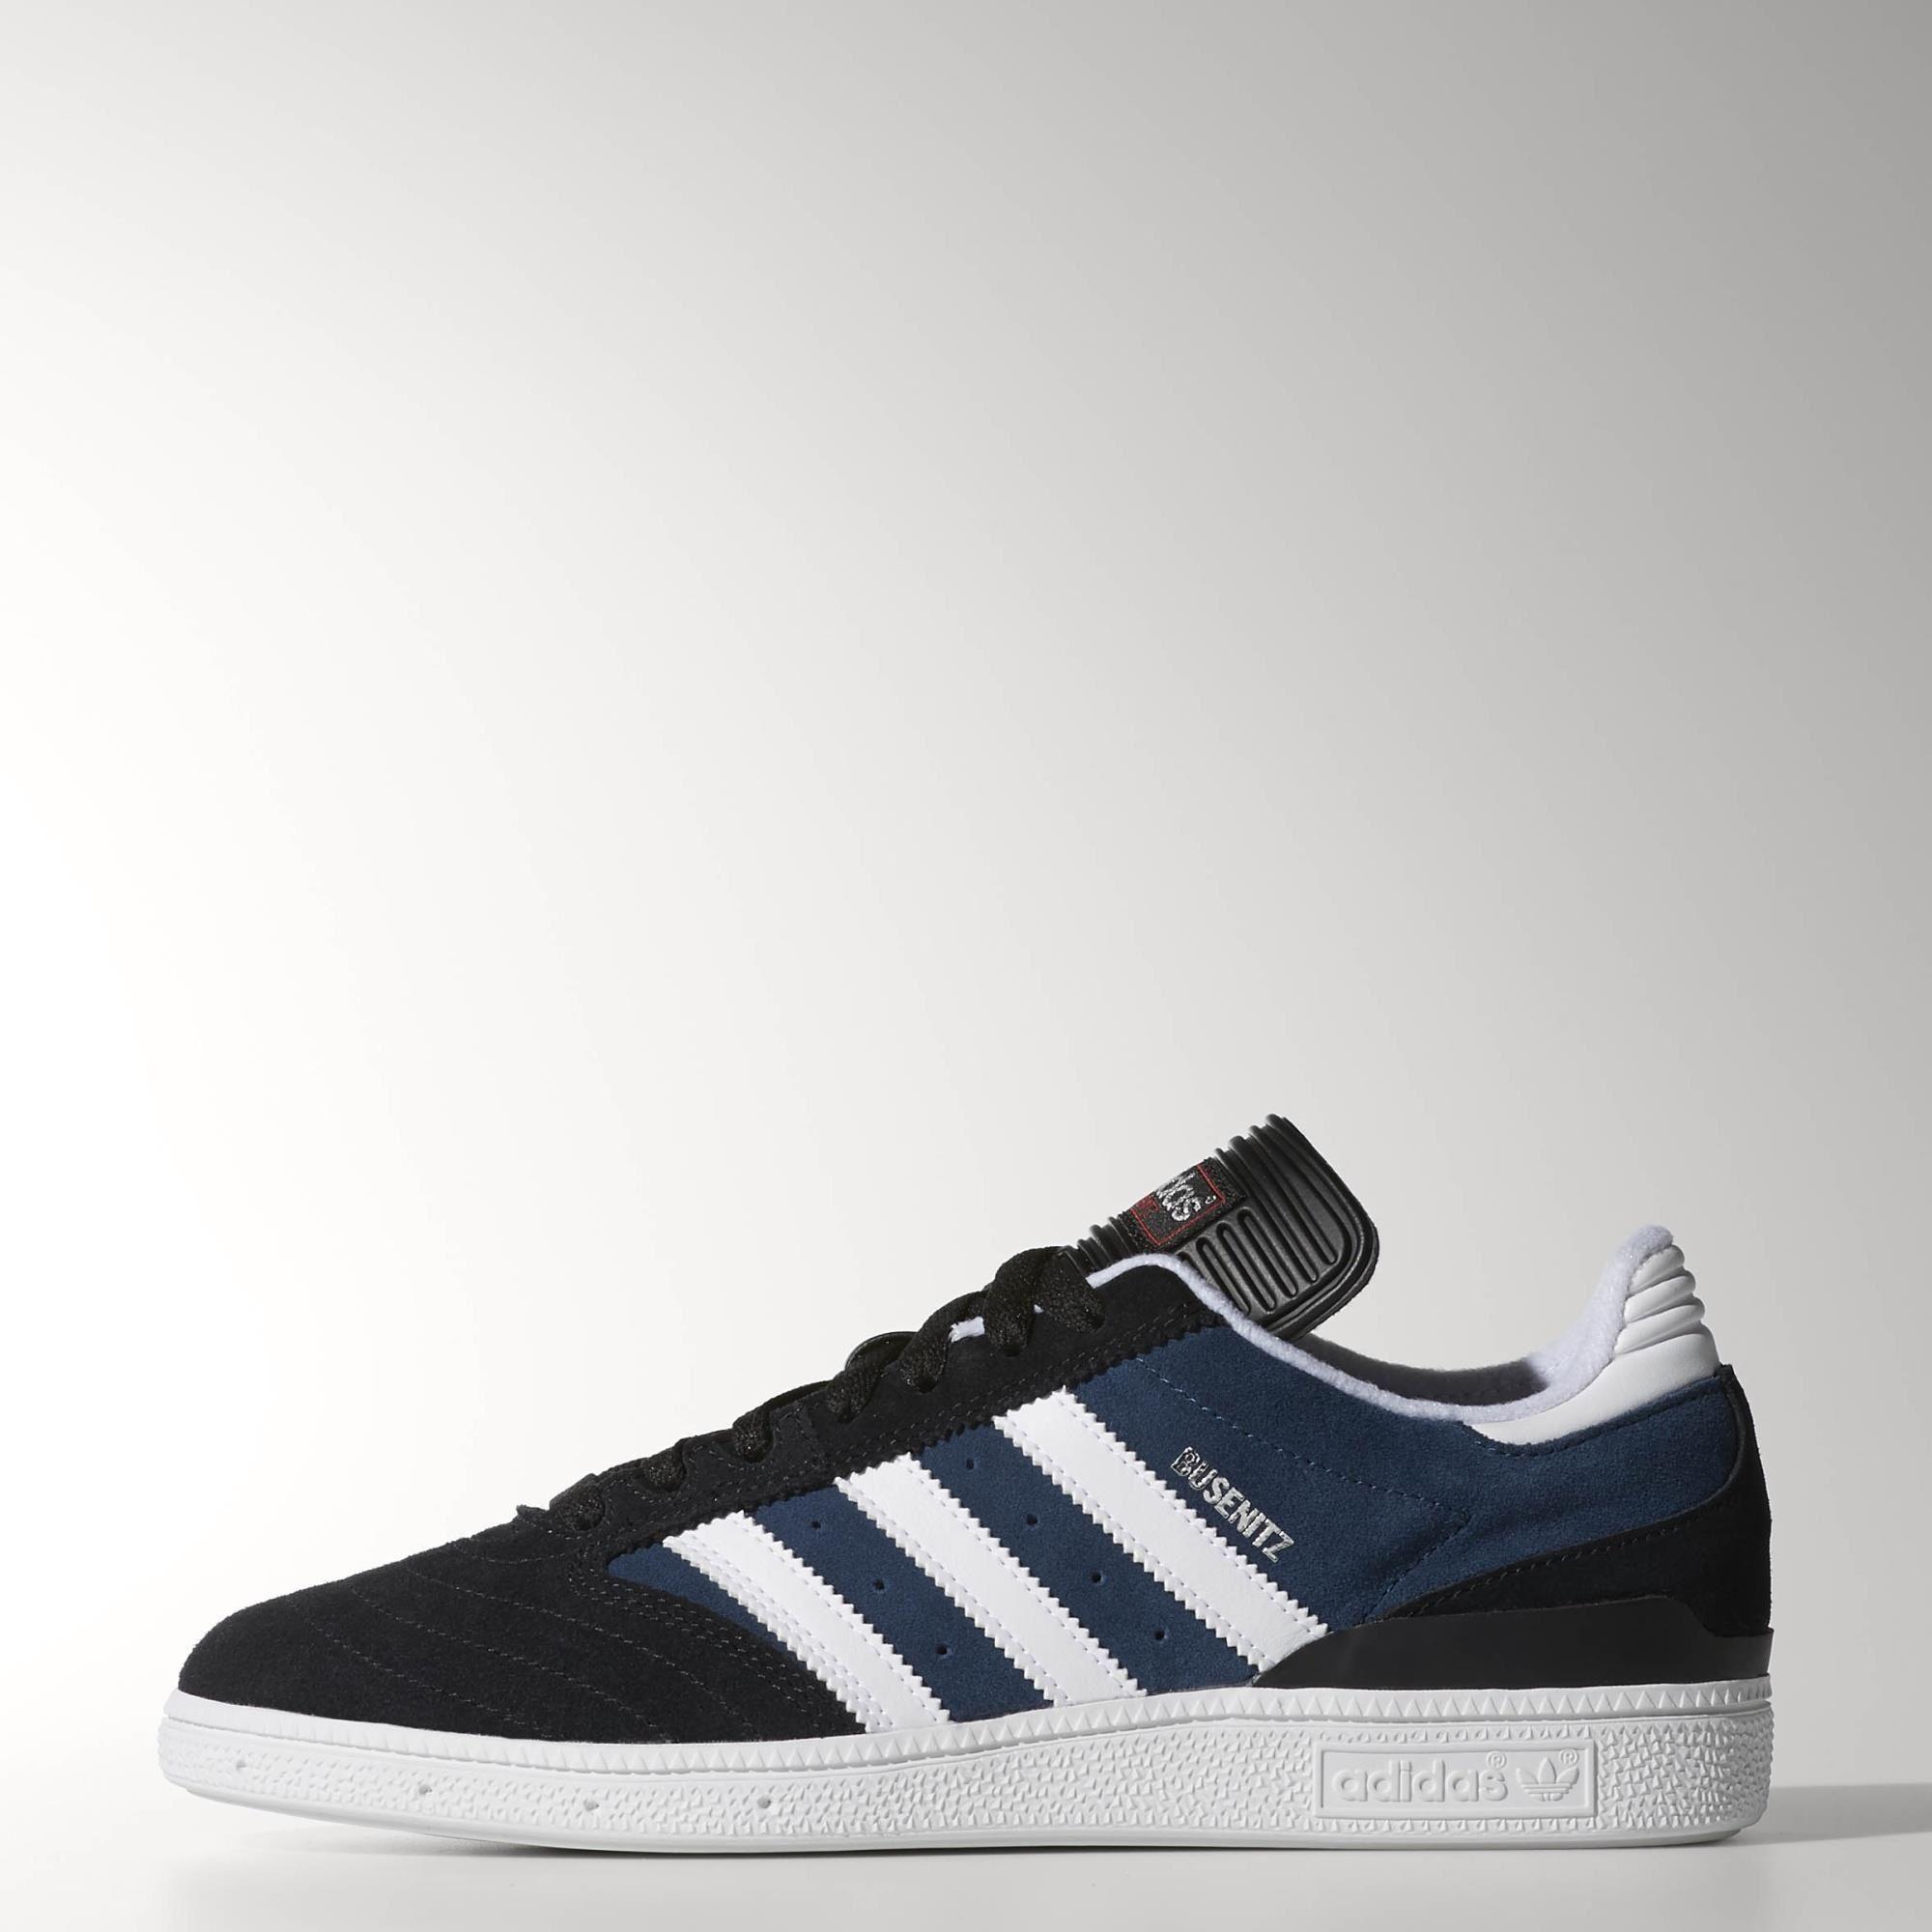 adidas Busenitz Shoes | shoes | Adidas busenitz, Adidas